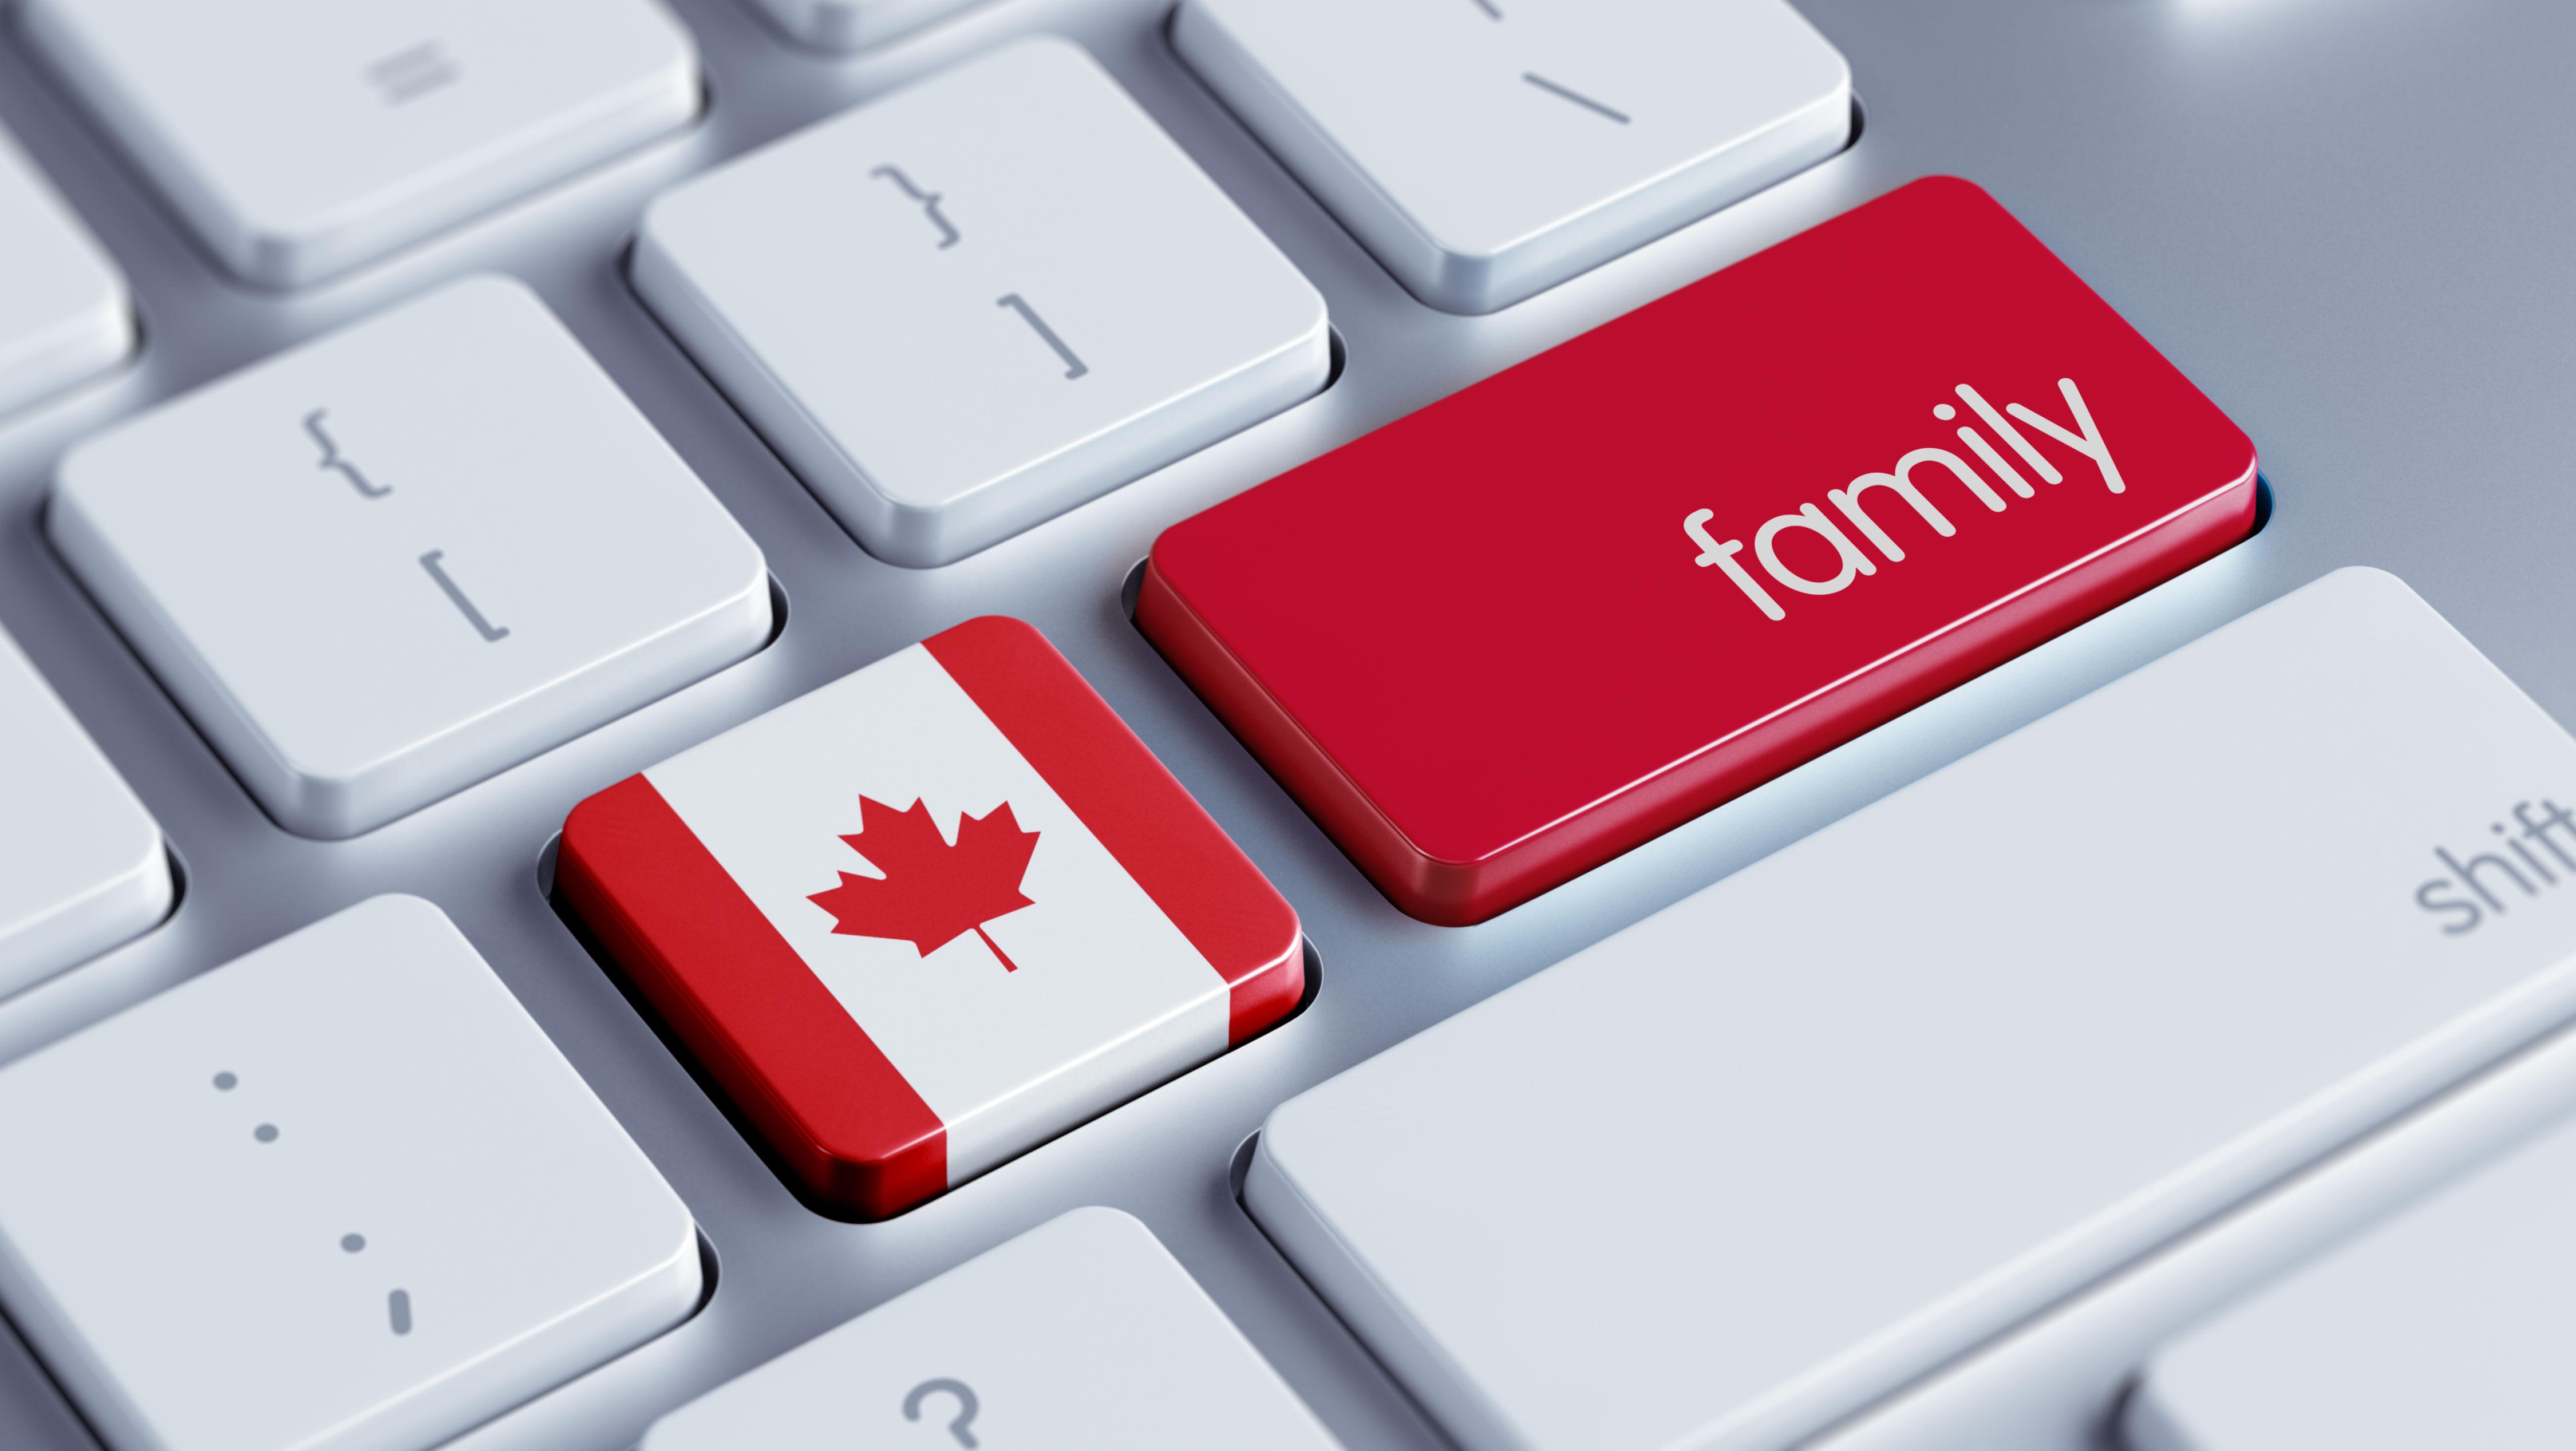 مهاجرت به کانادا از طریق اسپانسرشیپ